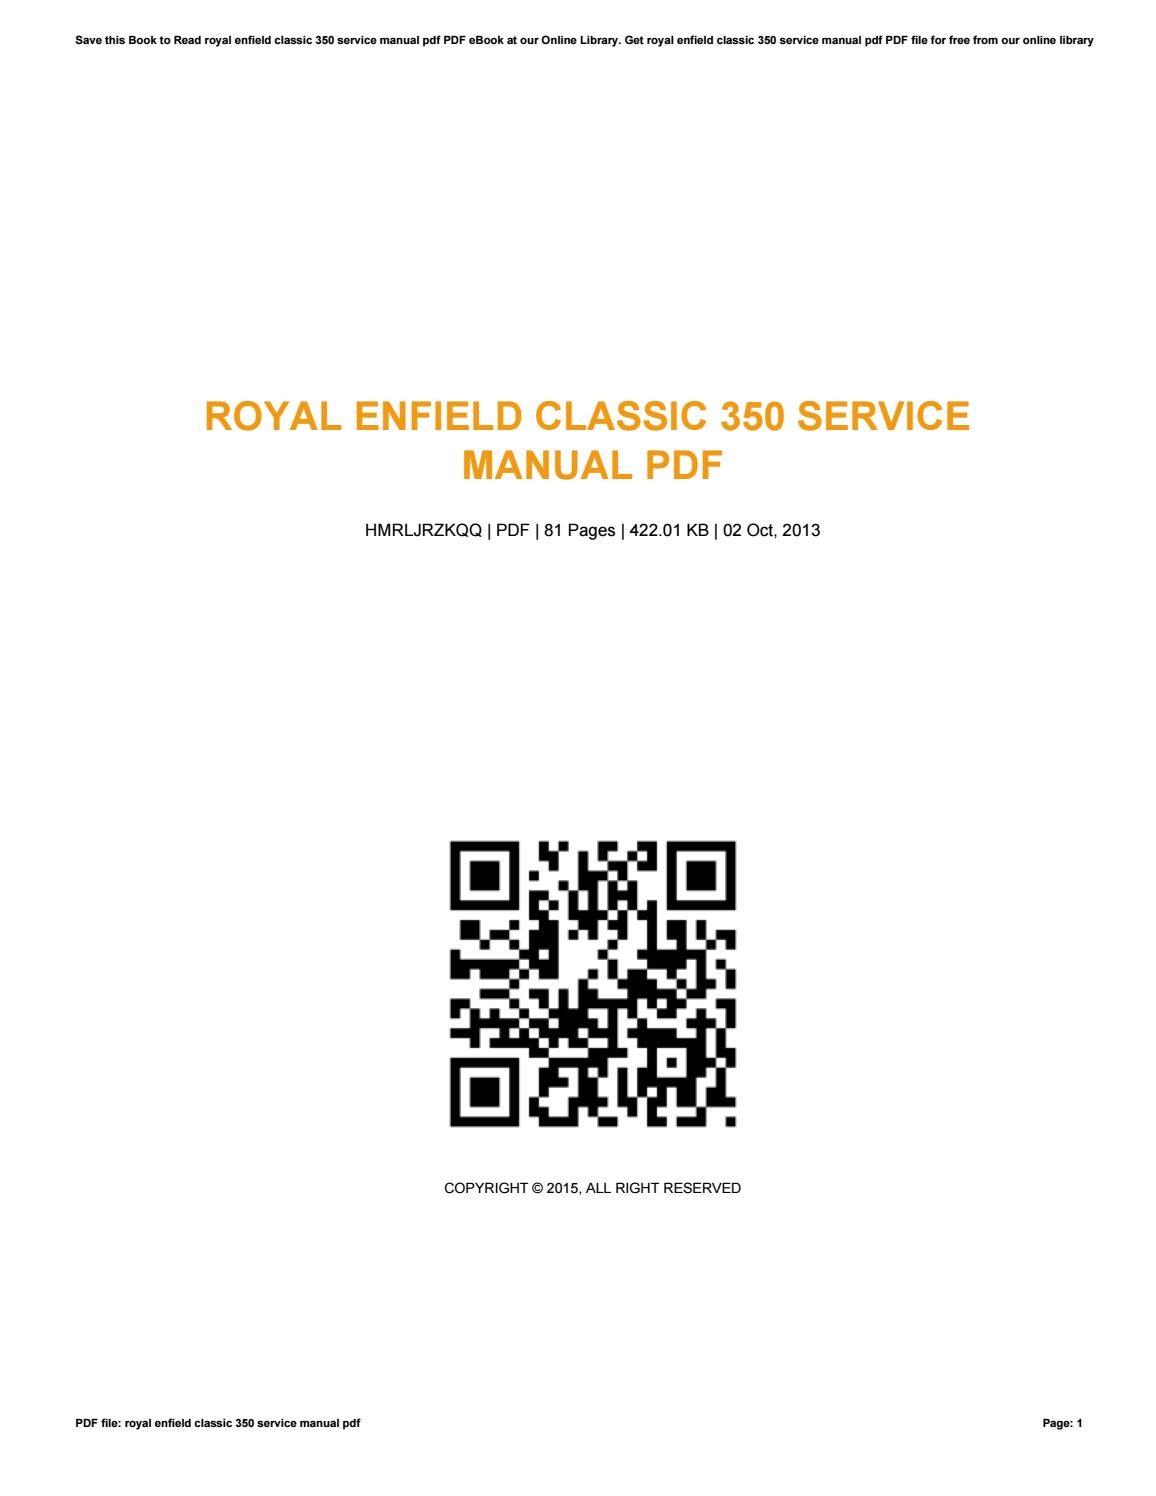 Großartig Royal Enfield Bullet Schaltplan Galerie - Elektrische ...